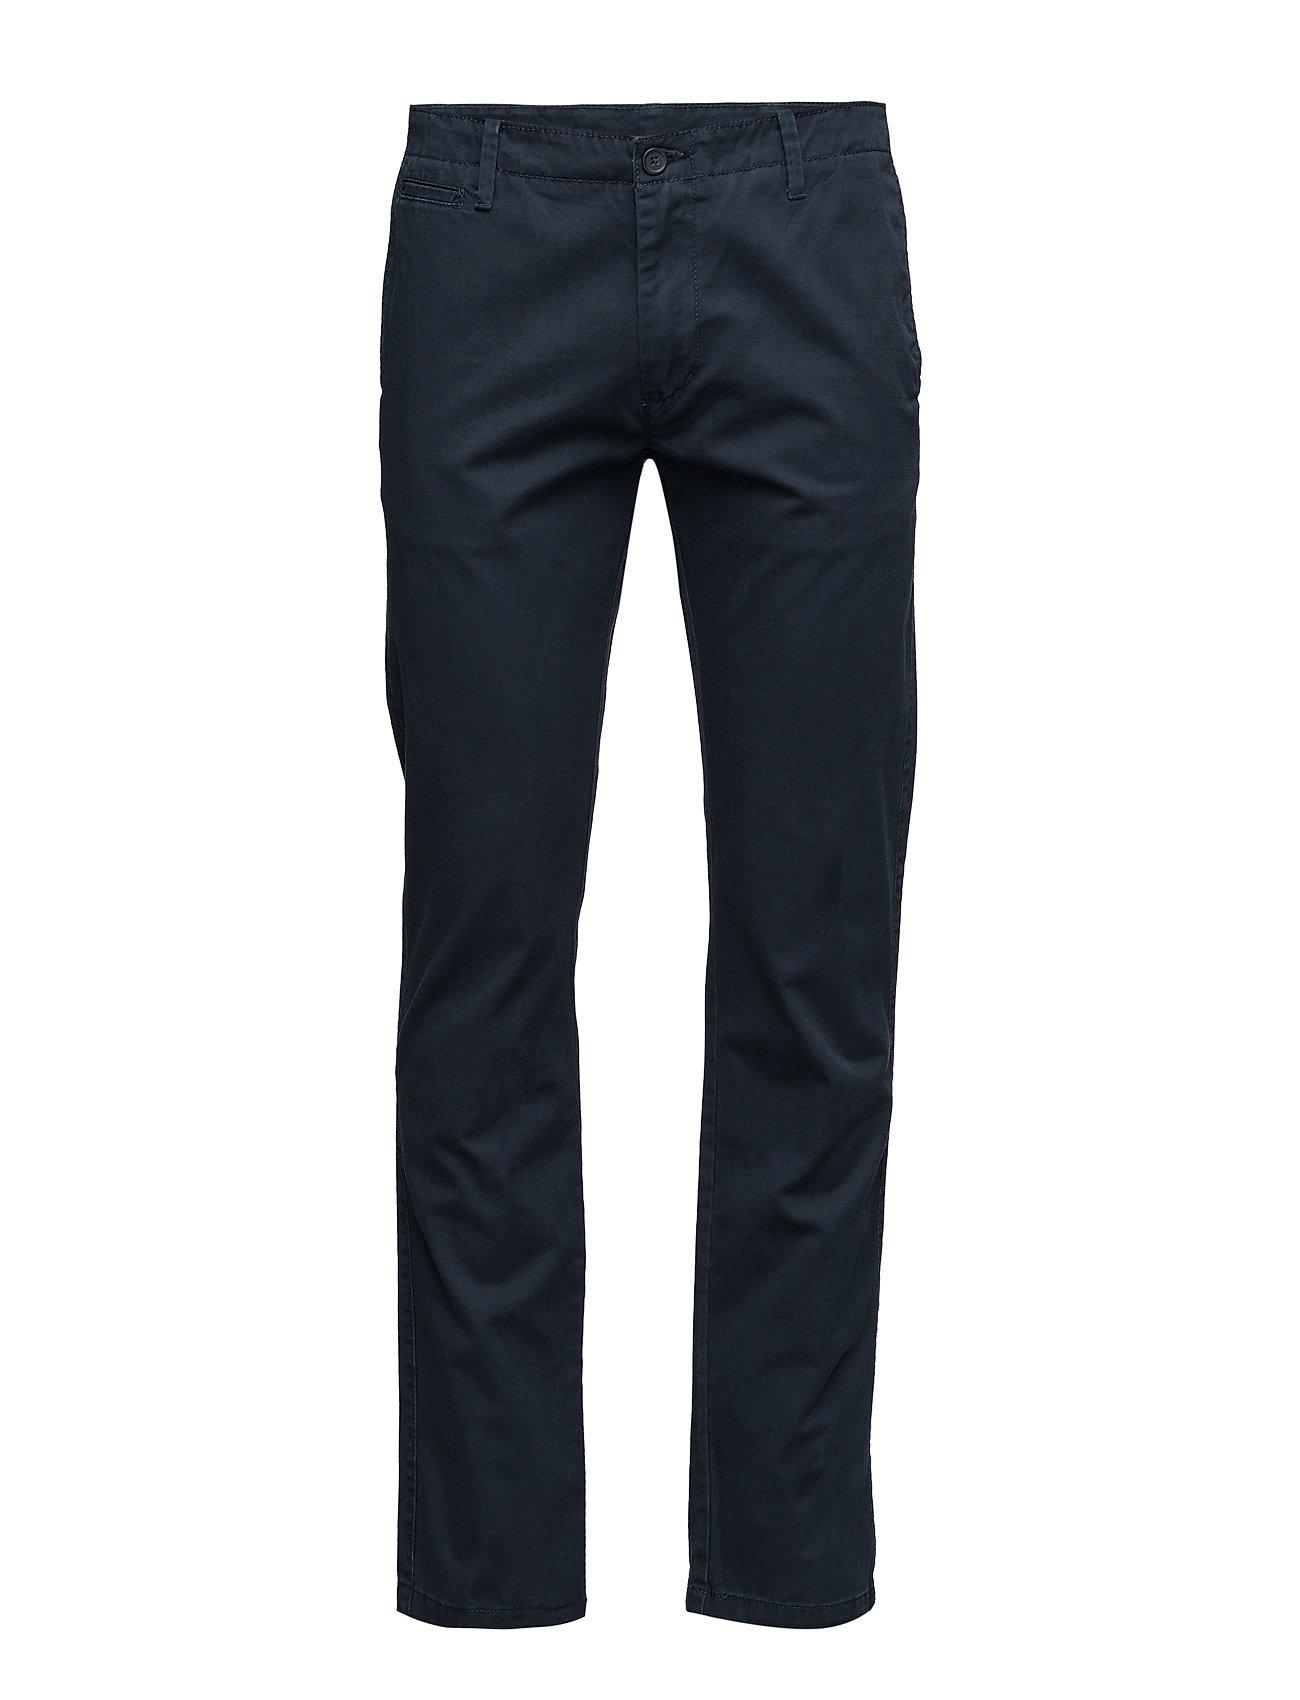 Trousers United Colors of Benetton Casual sko til Herrer i 06U